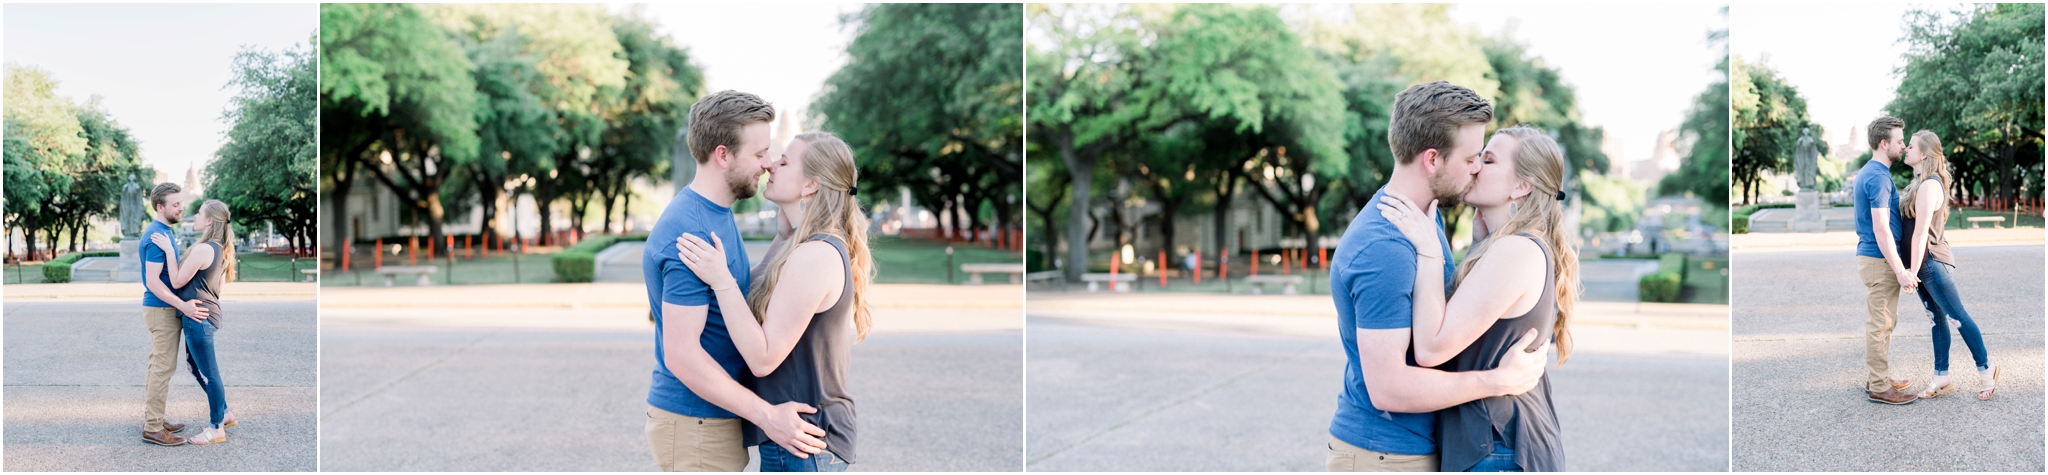 Allison&Colton_0020.jpg